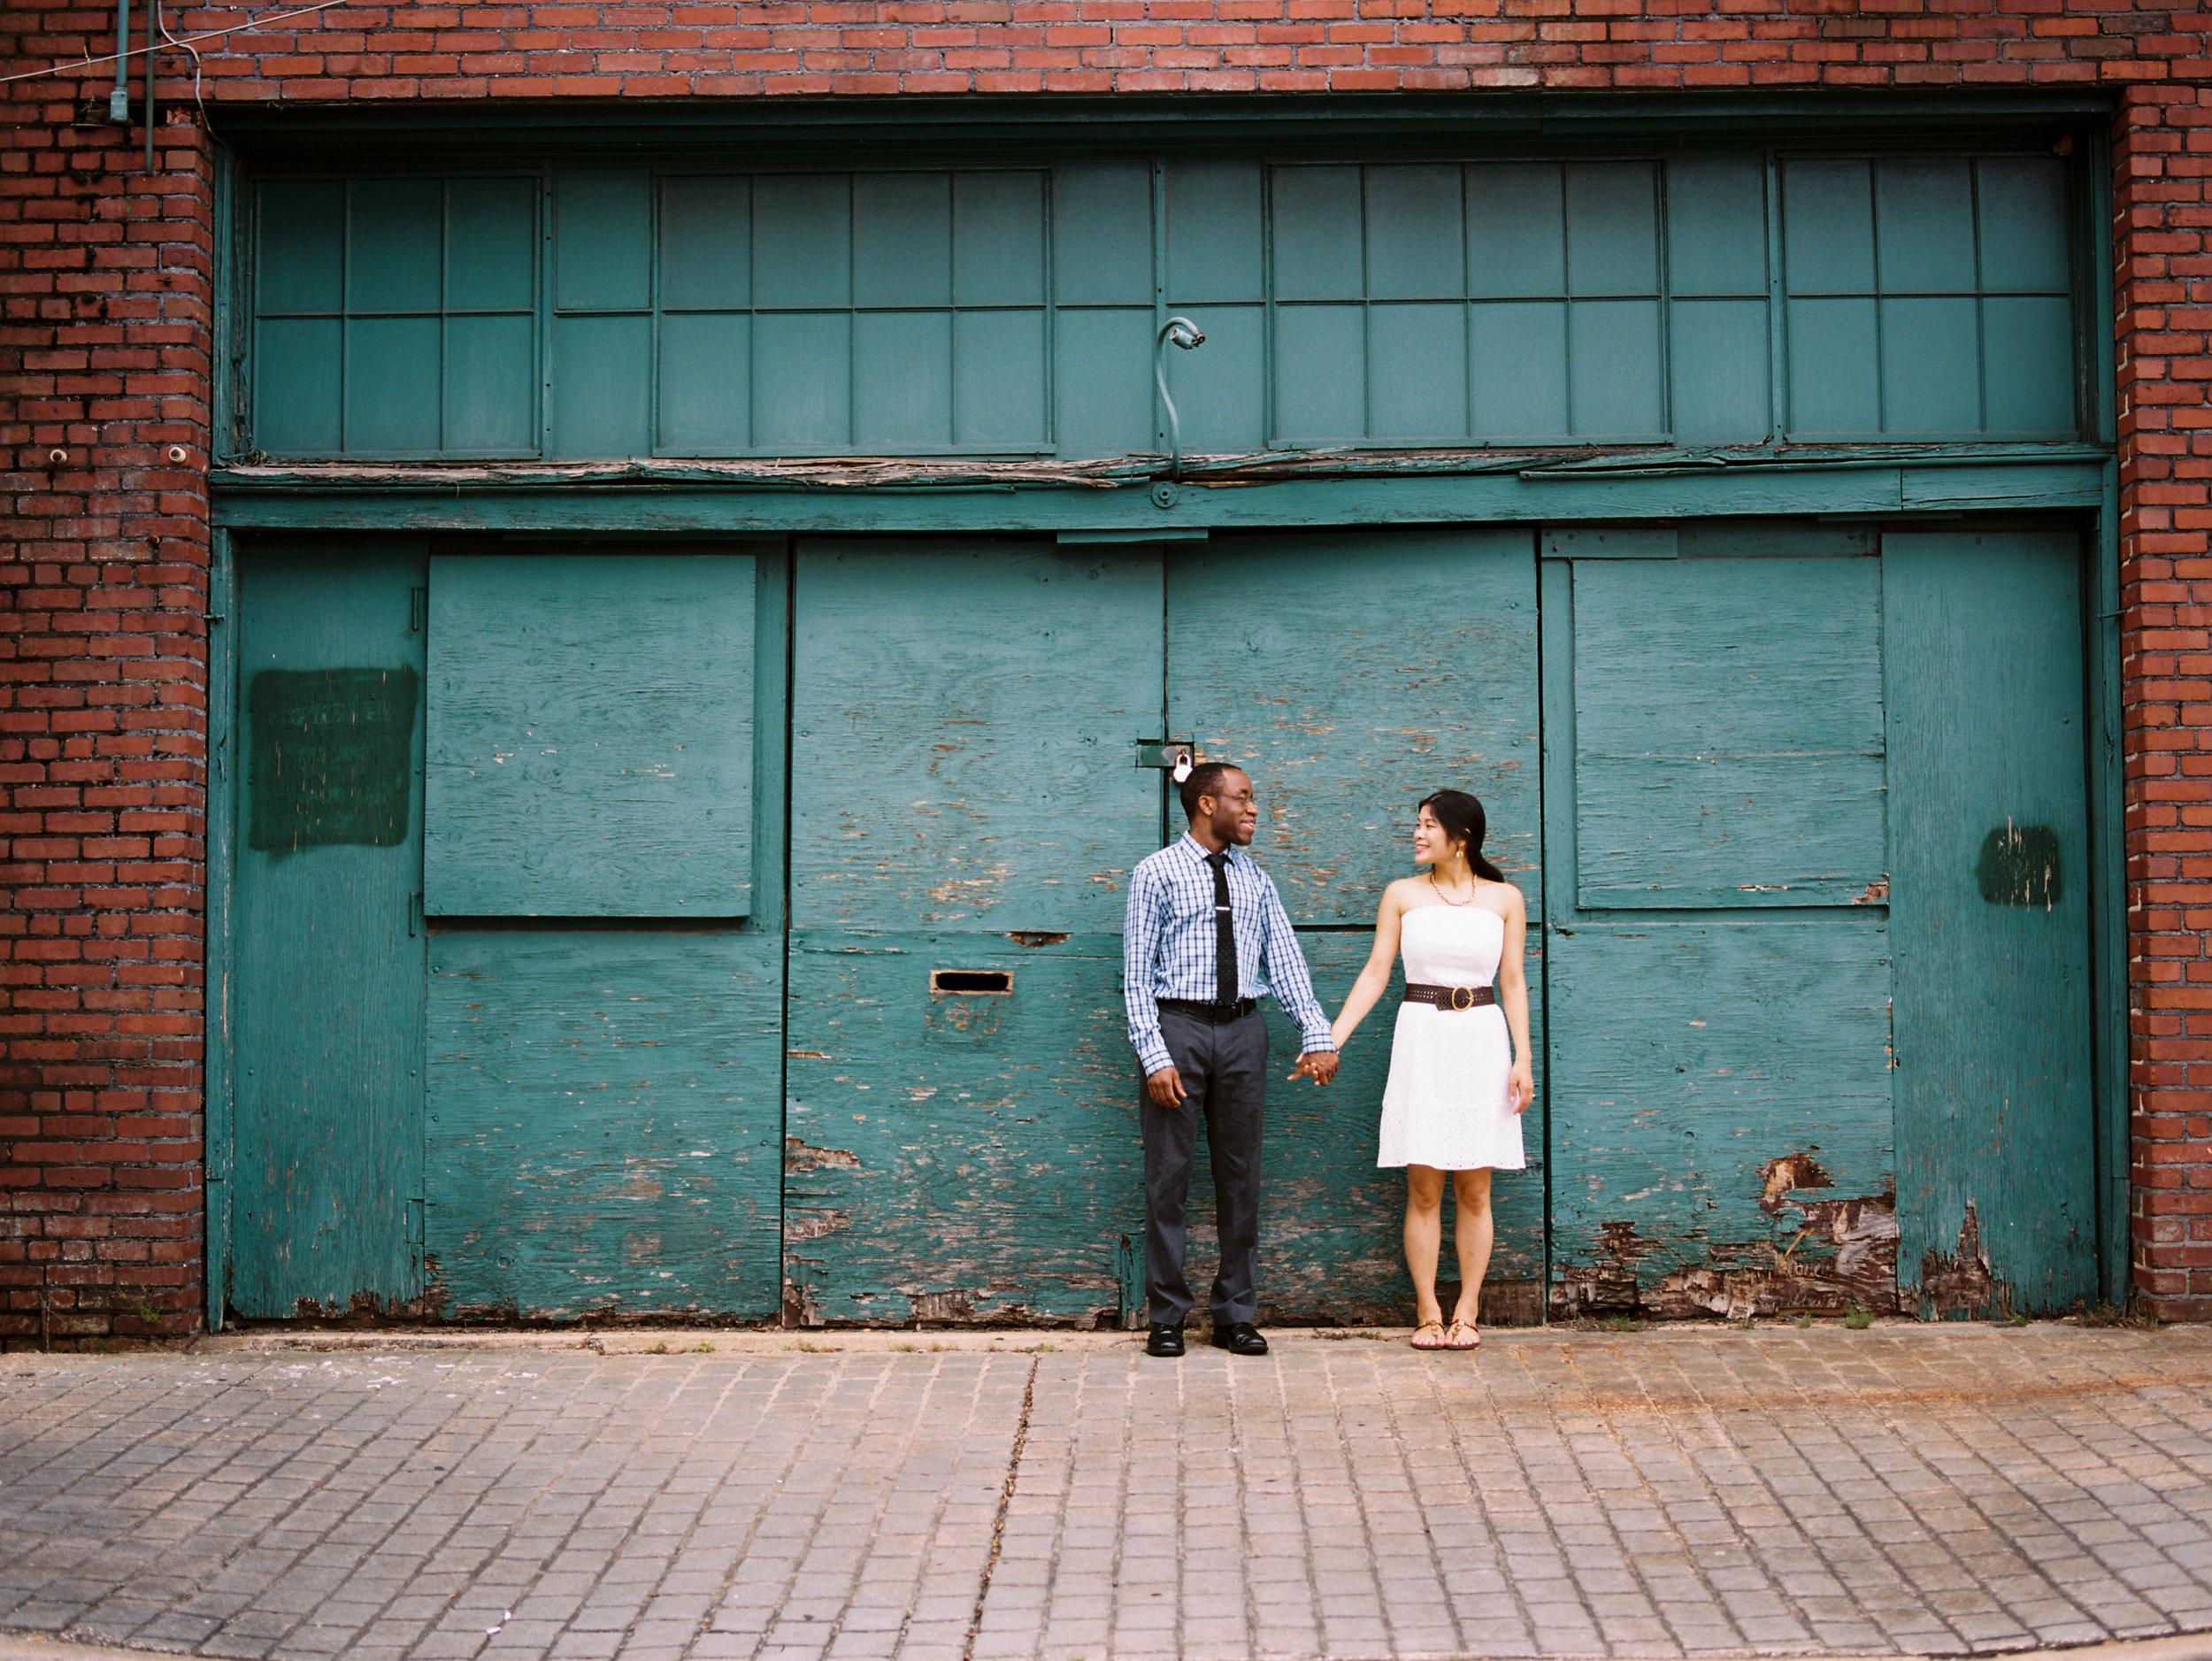 Nick-Drollette-Photography-Downtown Birmingham-Montgomery-101.jpg